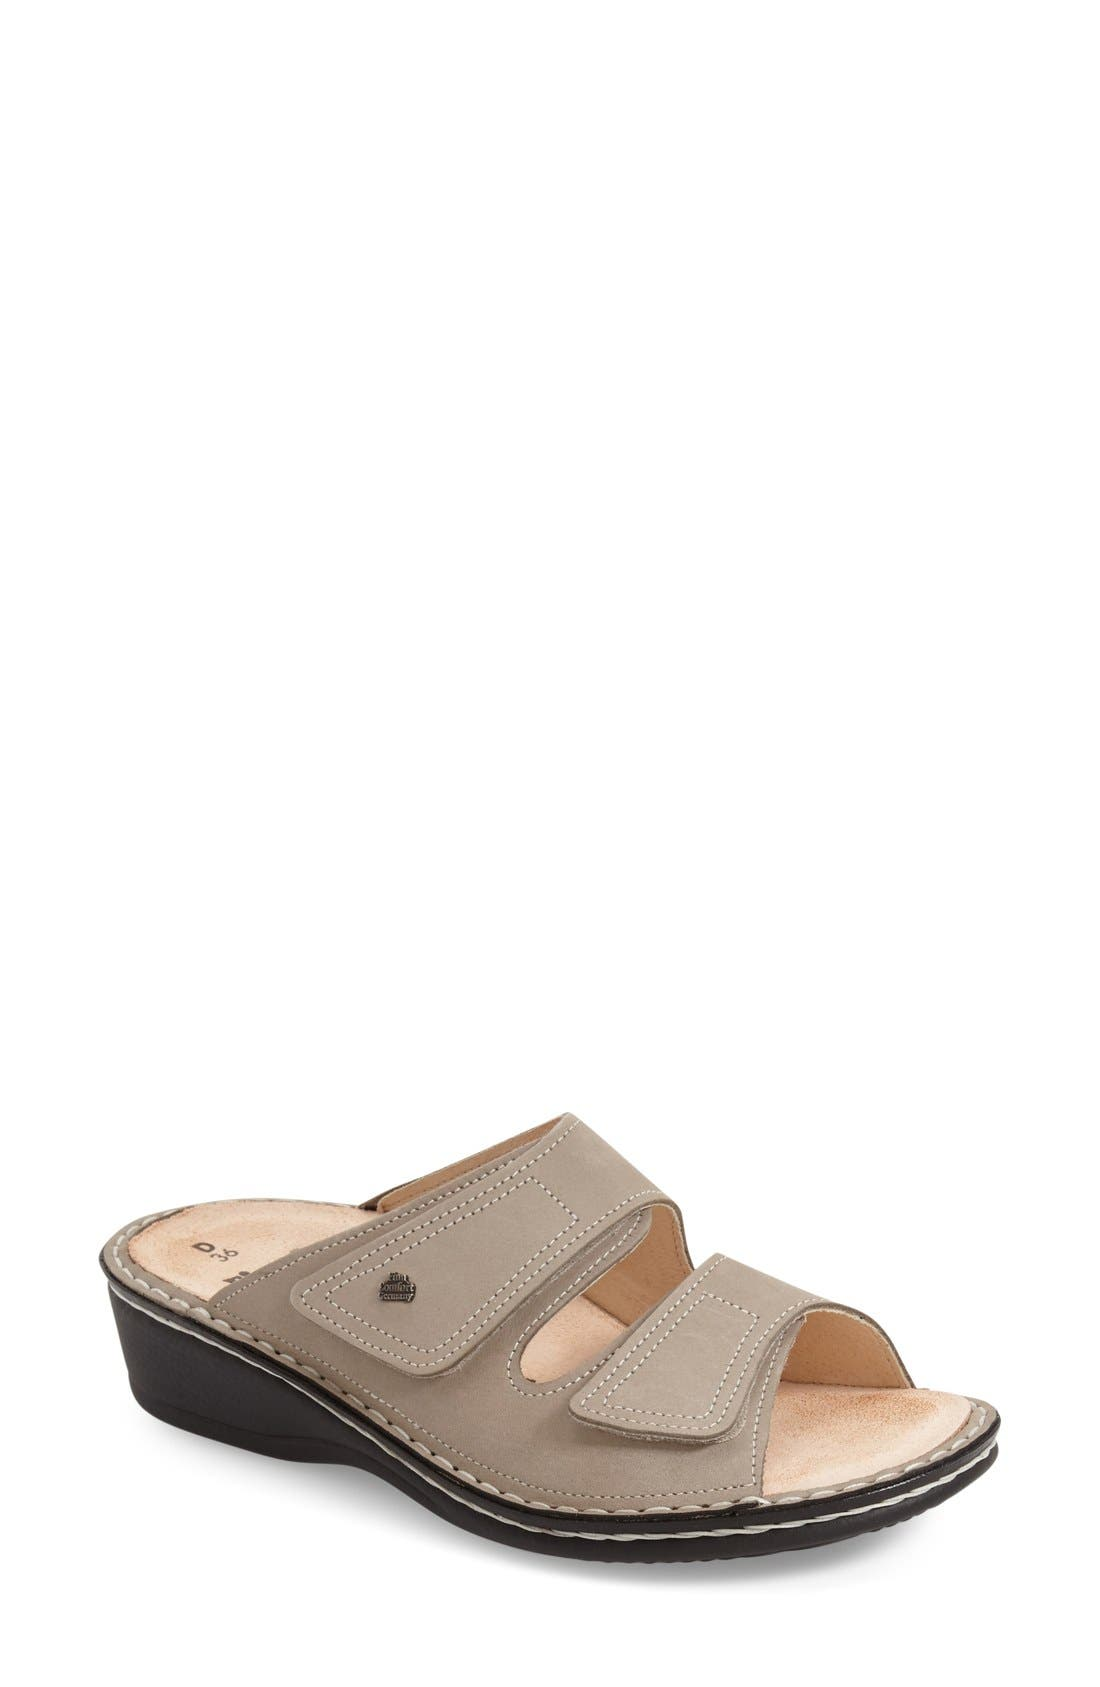 Finn 'Jamaica' Sandal,                         Main,                         color, Rock Nubuck Leather